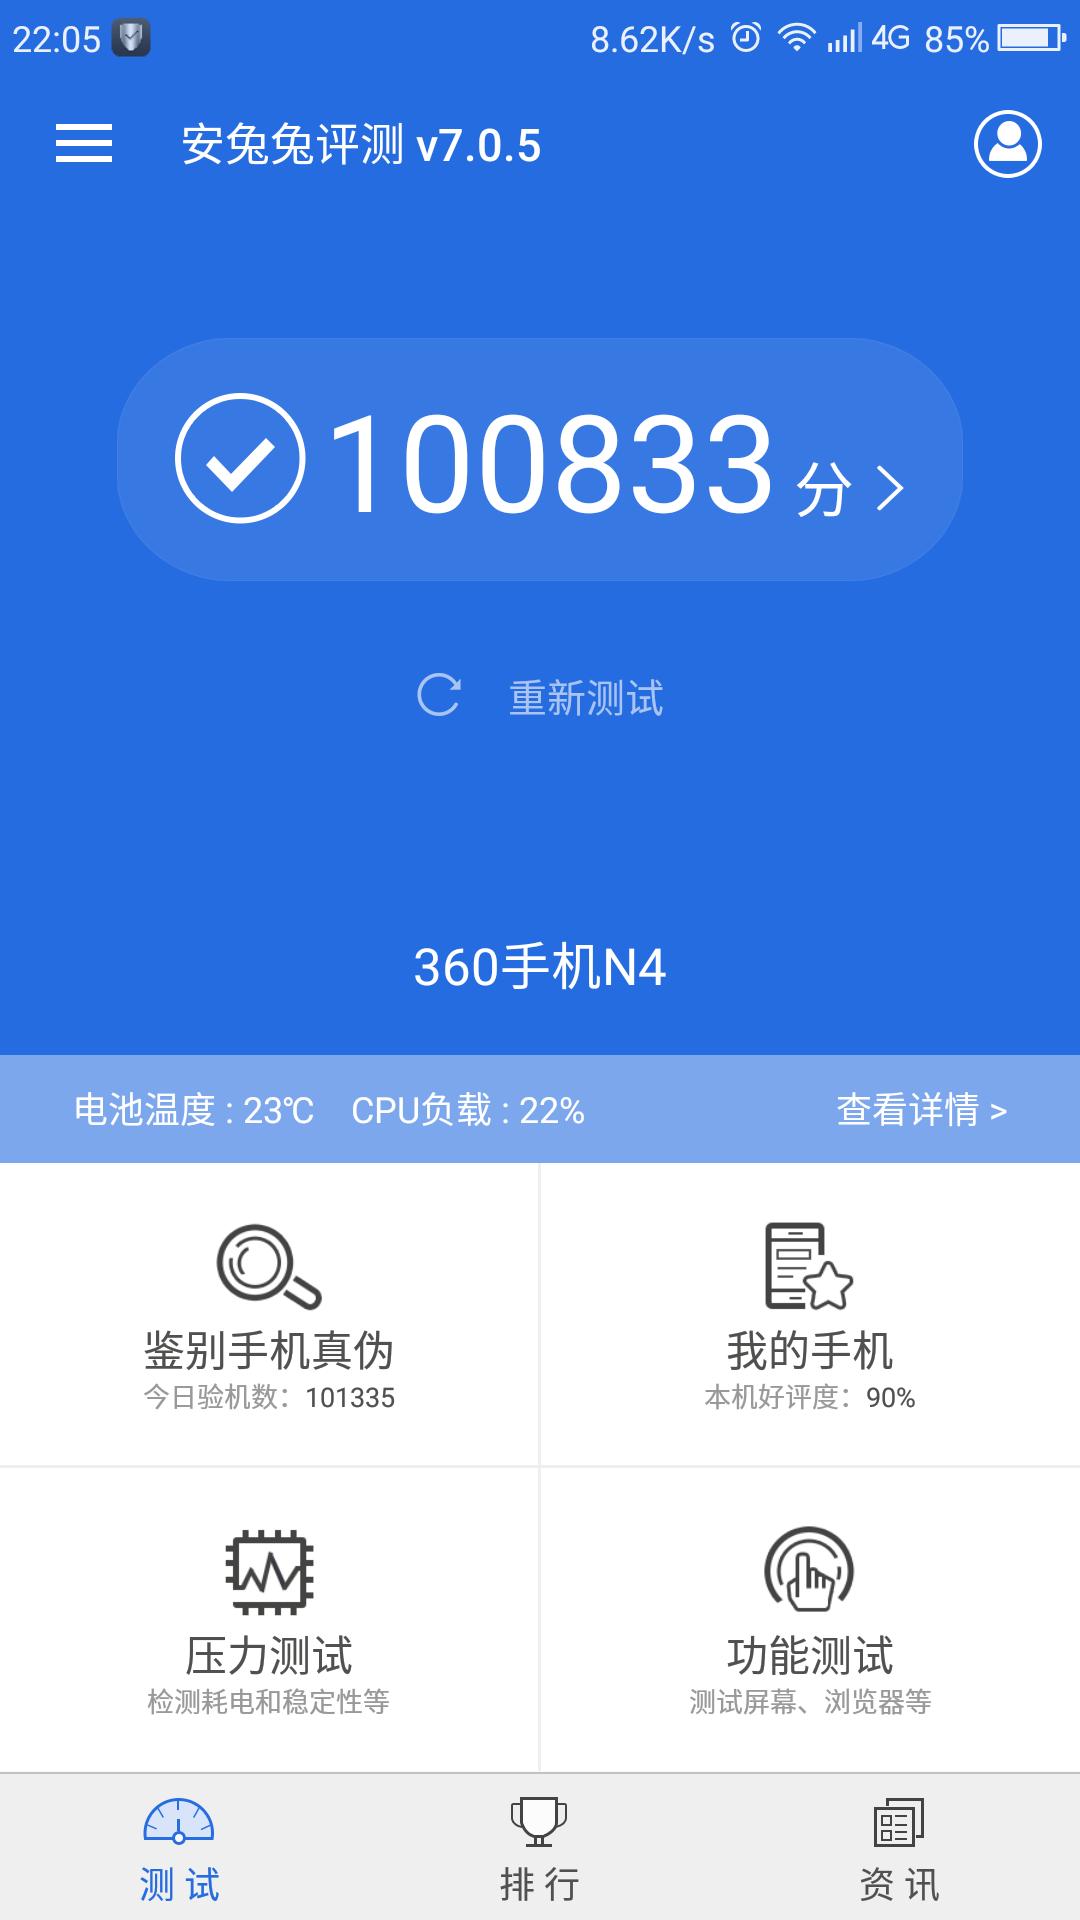 Screenshot_2018-03-04-22-05-16.png